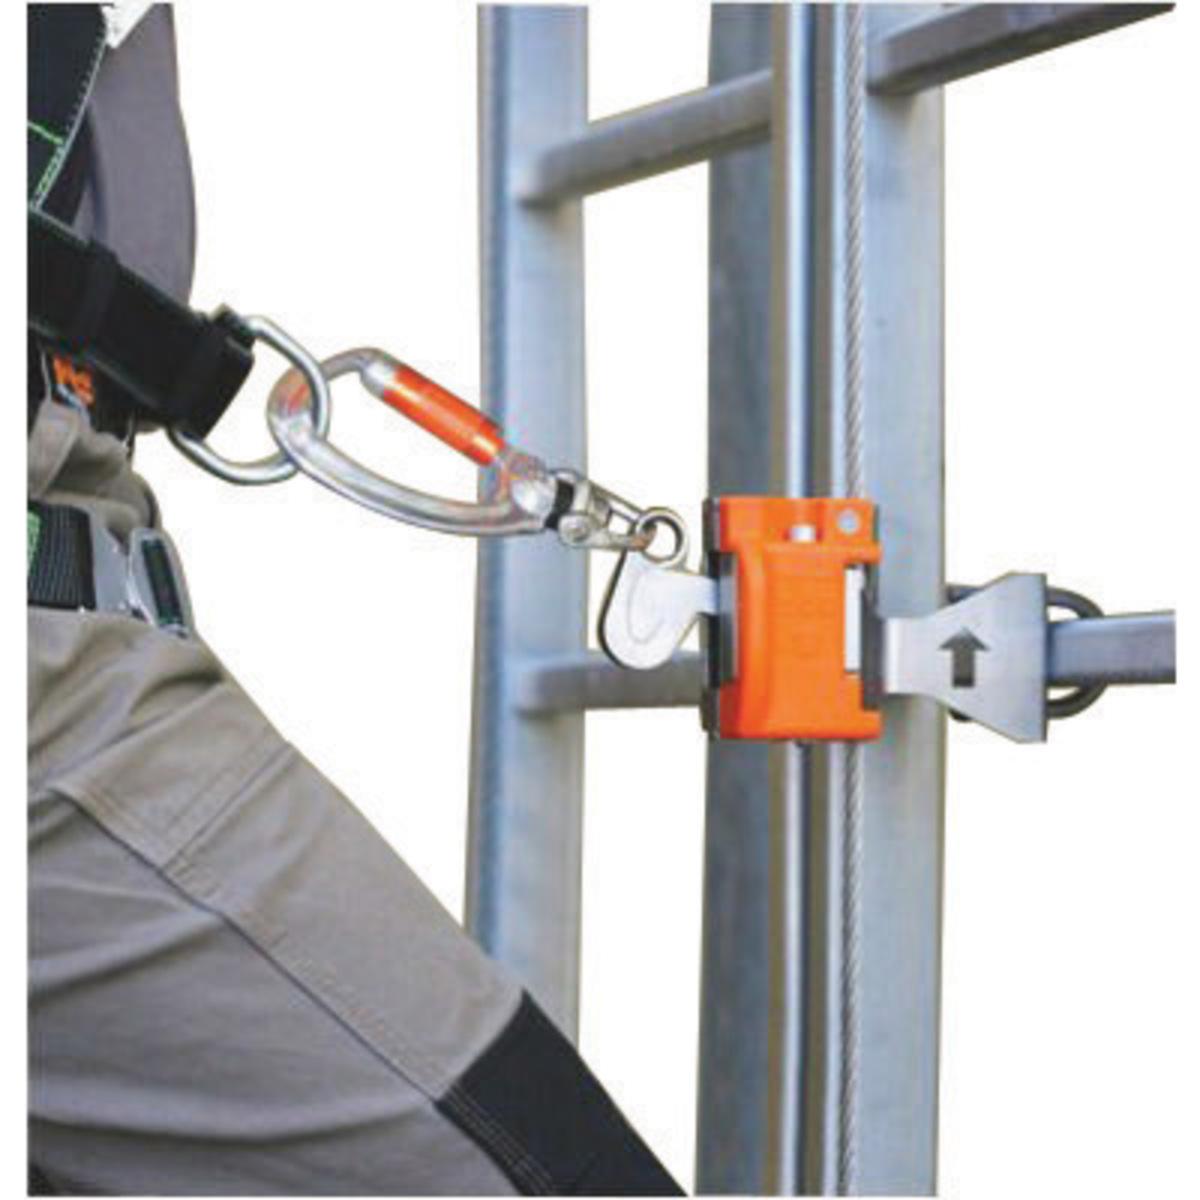 Ladder Climbing Safety